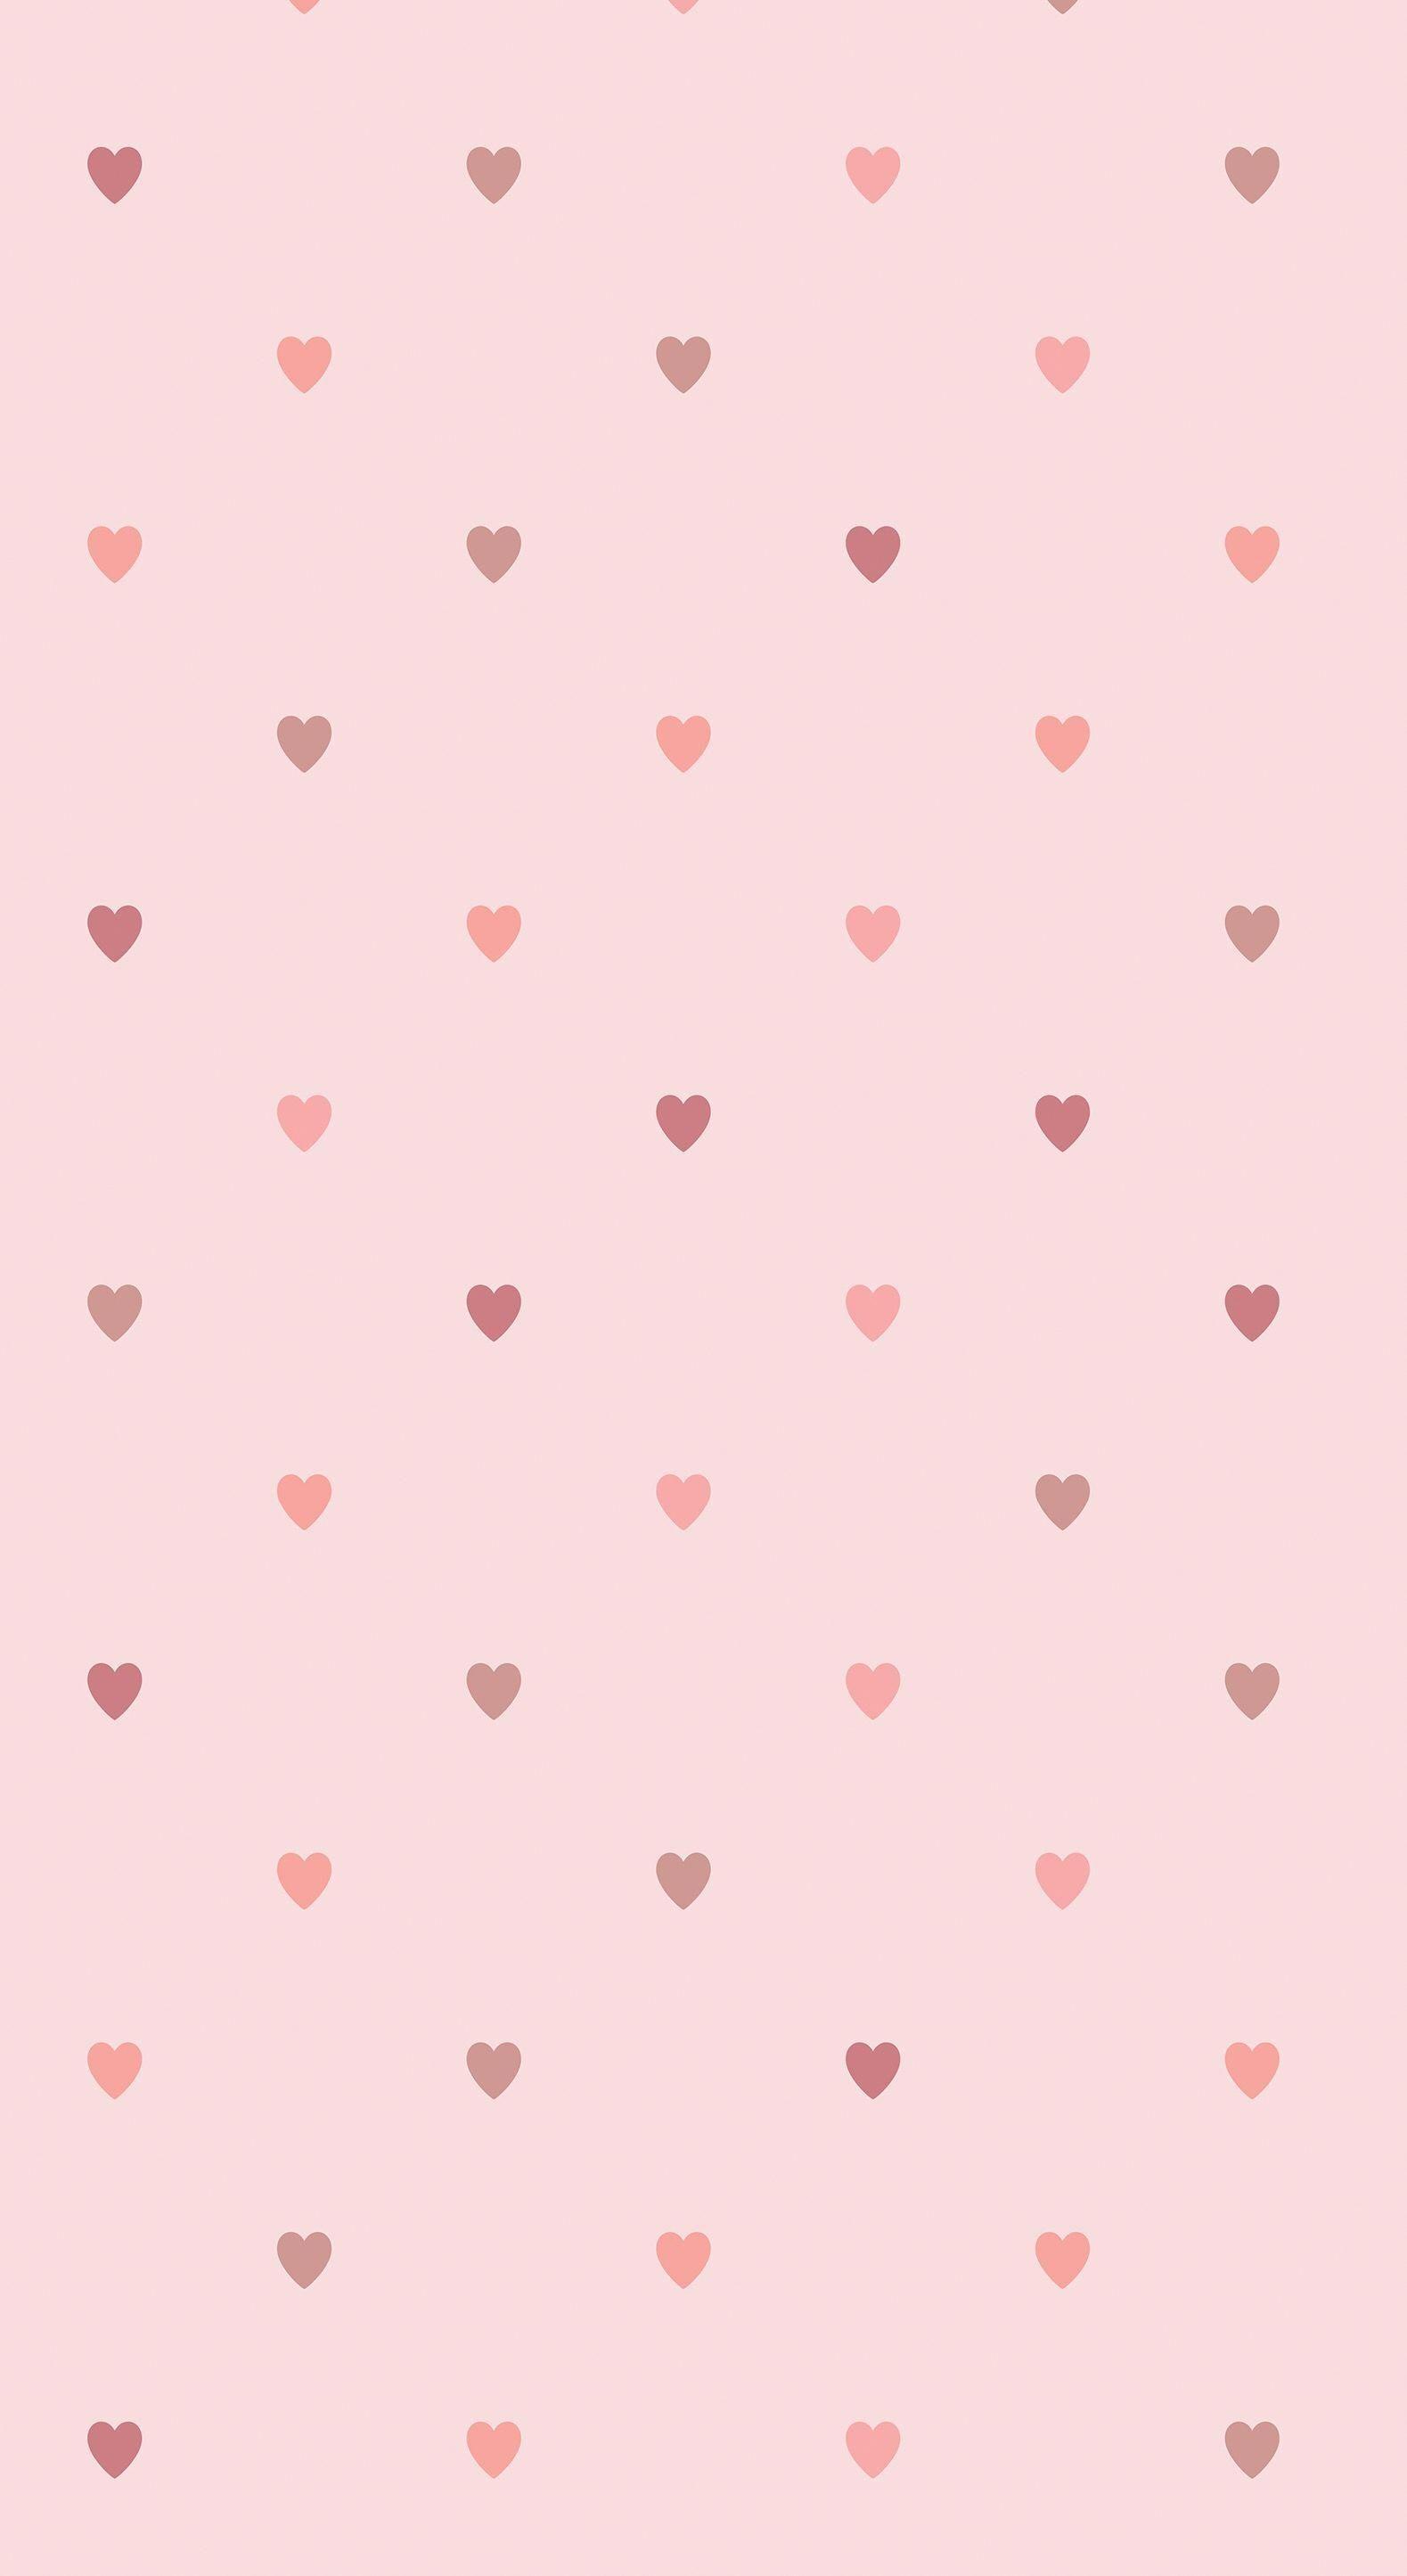 Pink Heart Iphone Wallpaper Iphonewallpaper Papel De Parede Cor De Rosa Papel De Parede De Fundo Plano De Fundo De Glitter